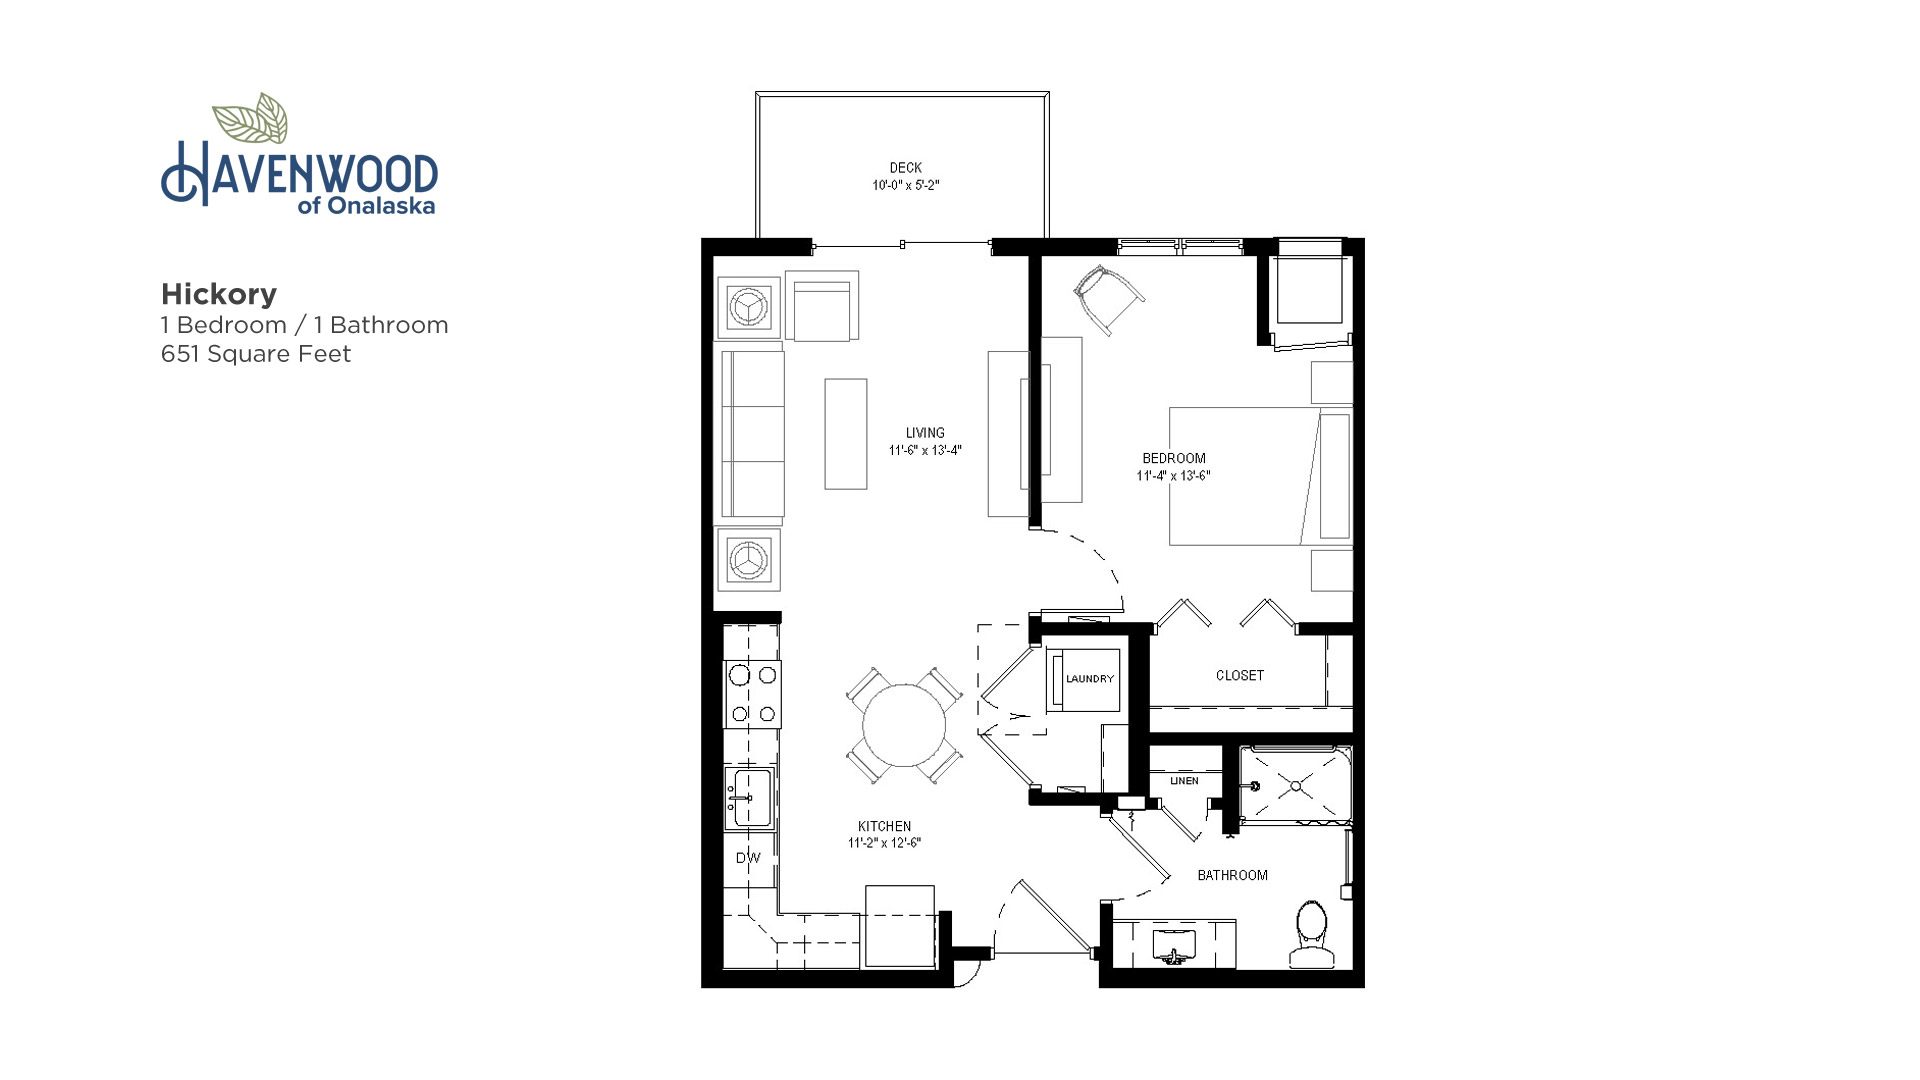 Havenwood of Onalaska Hickory Floor Plan